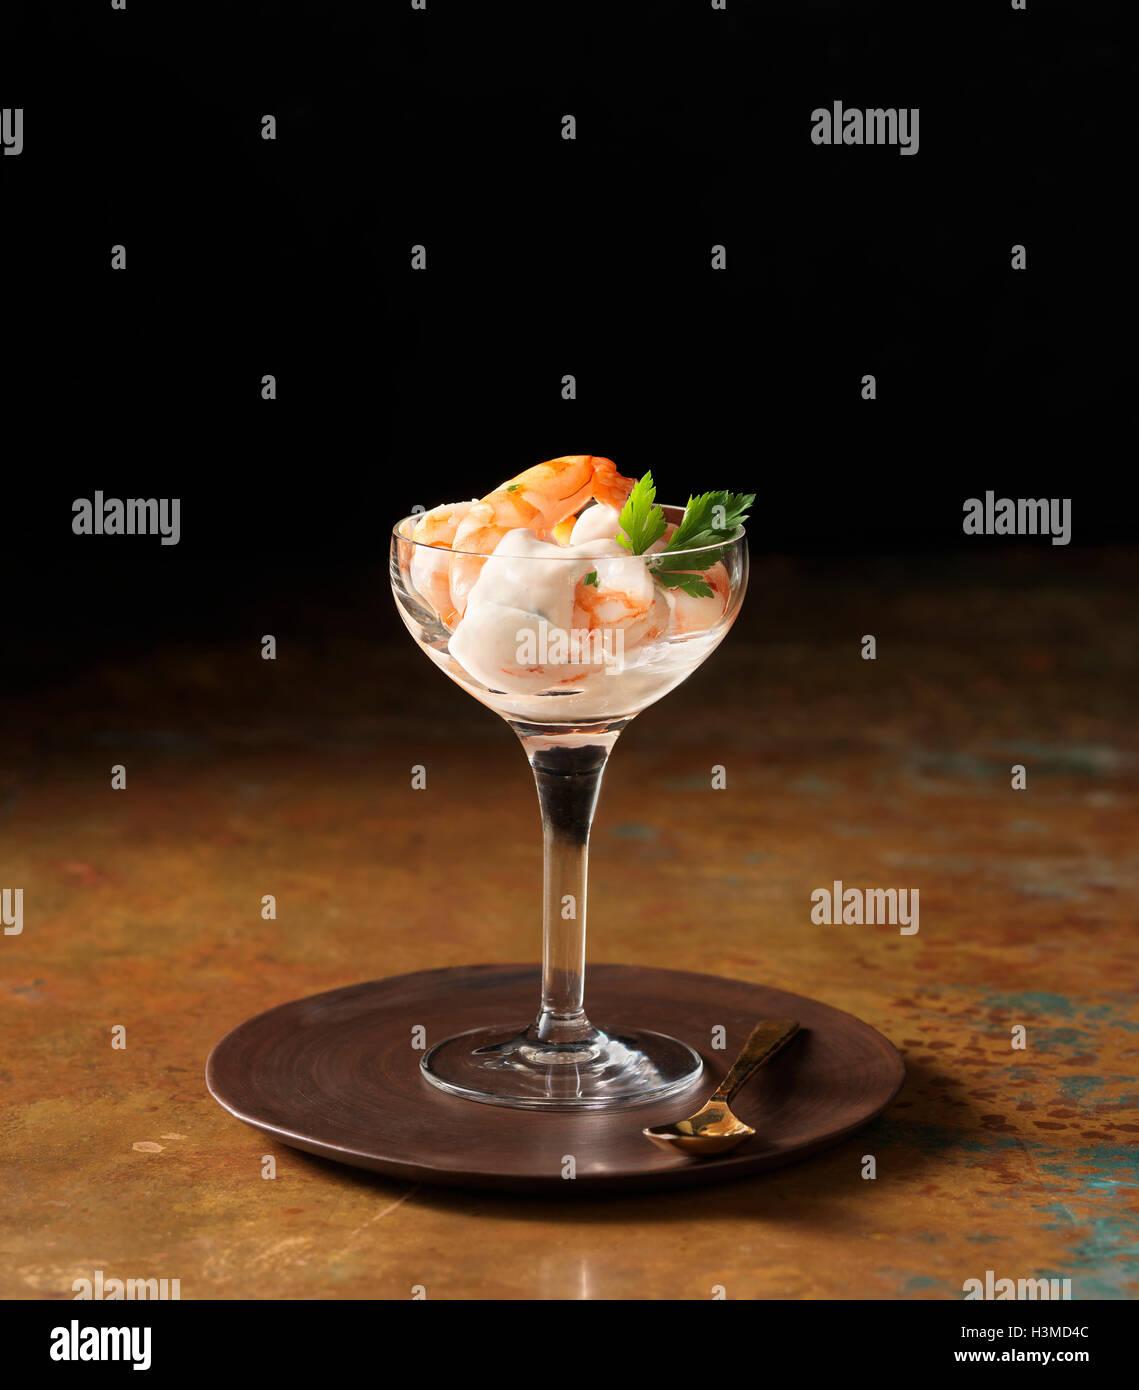 Posh prawn cocktail in wine glass with coriander - Stock Image